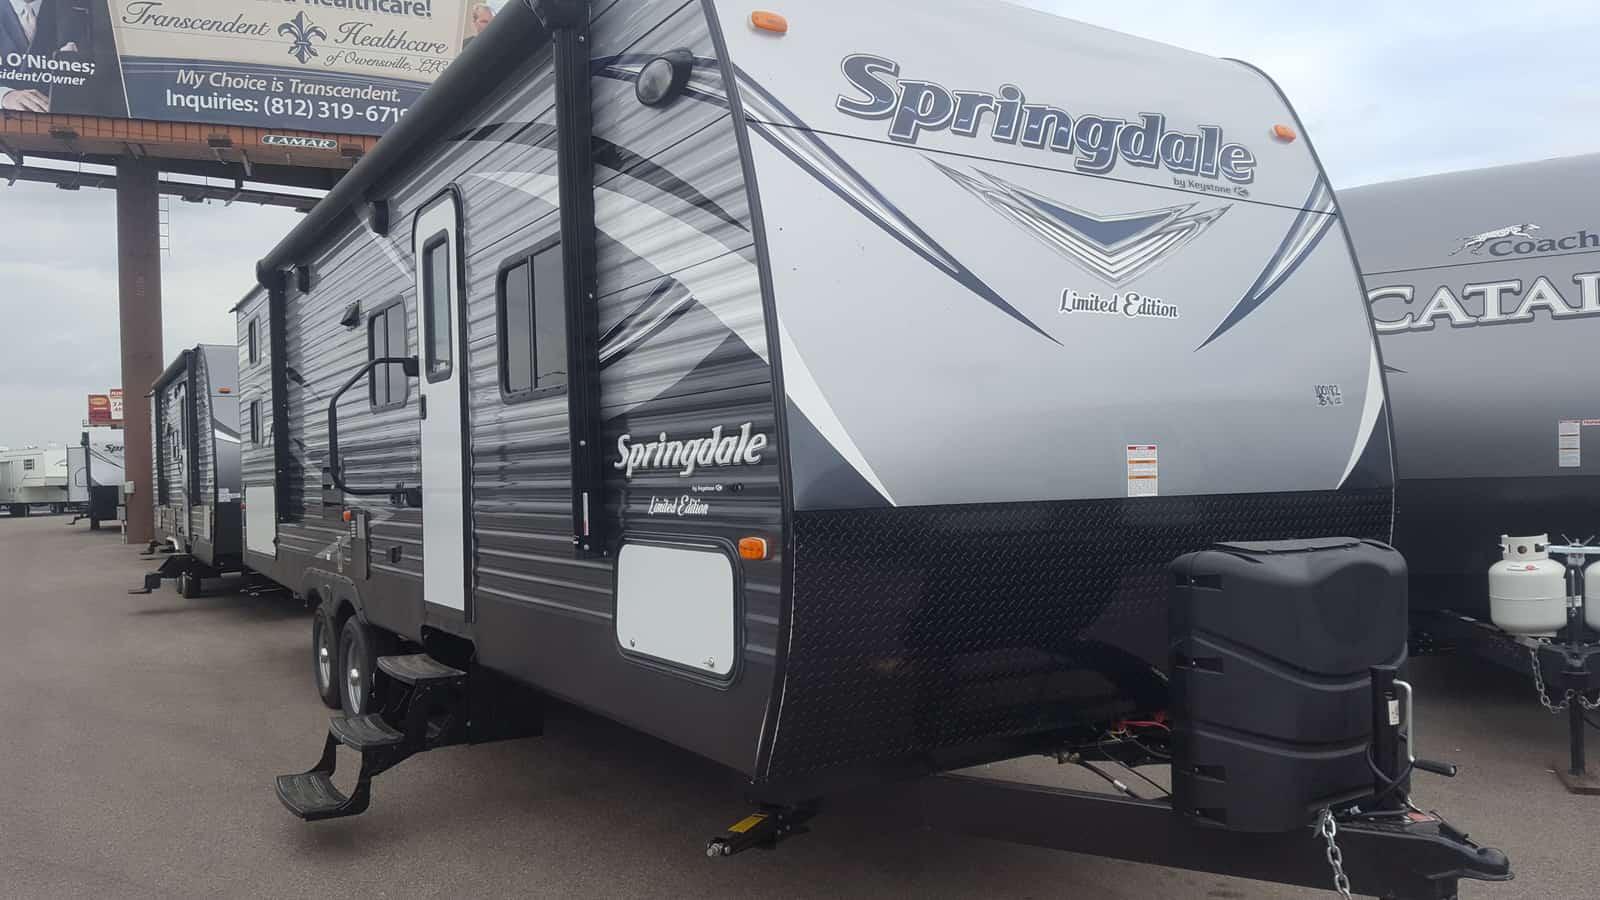 NEW 2018 Keystone SPRINGDALE 270LE - American RV